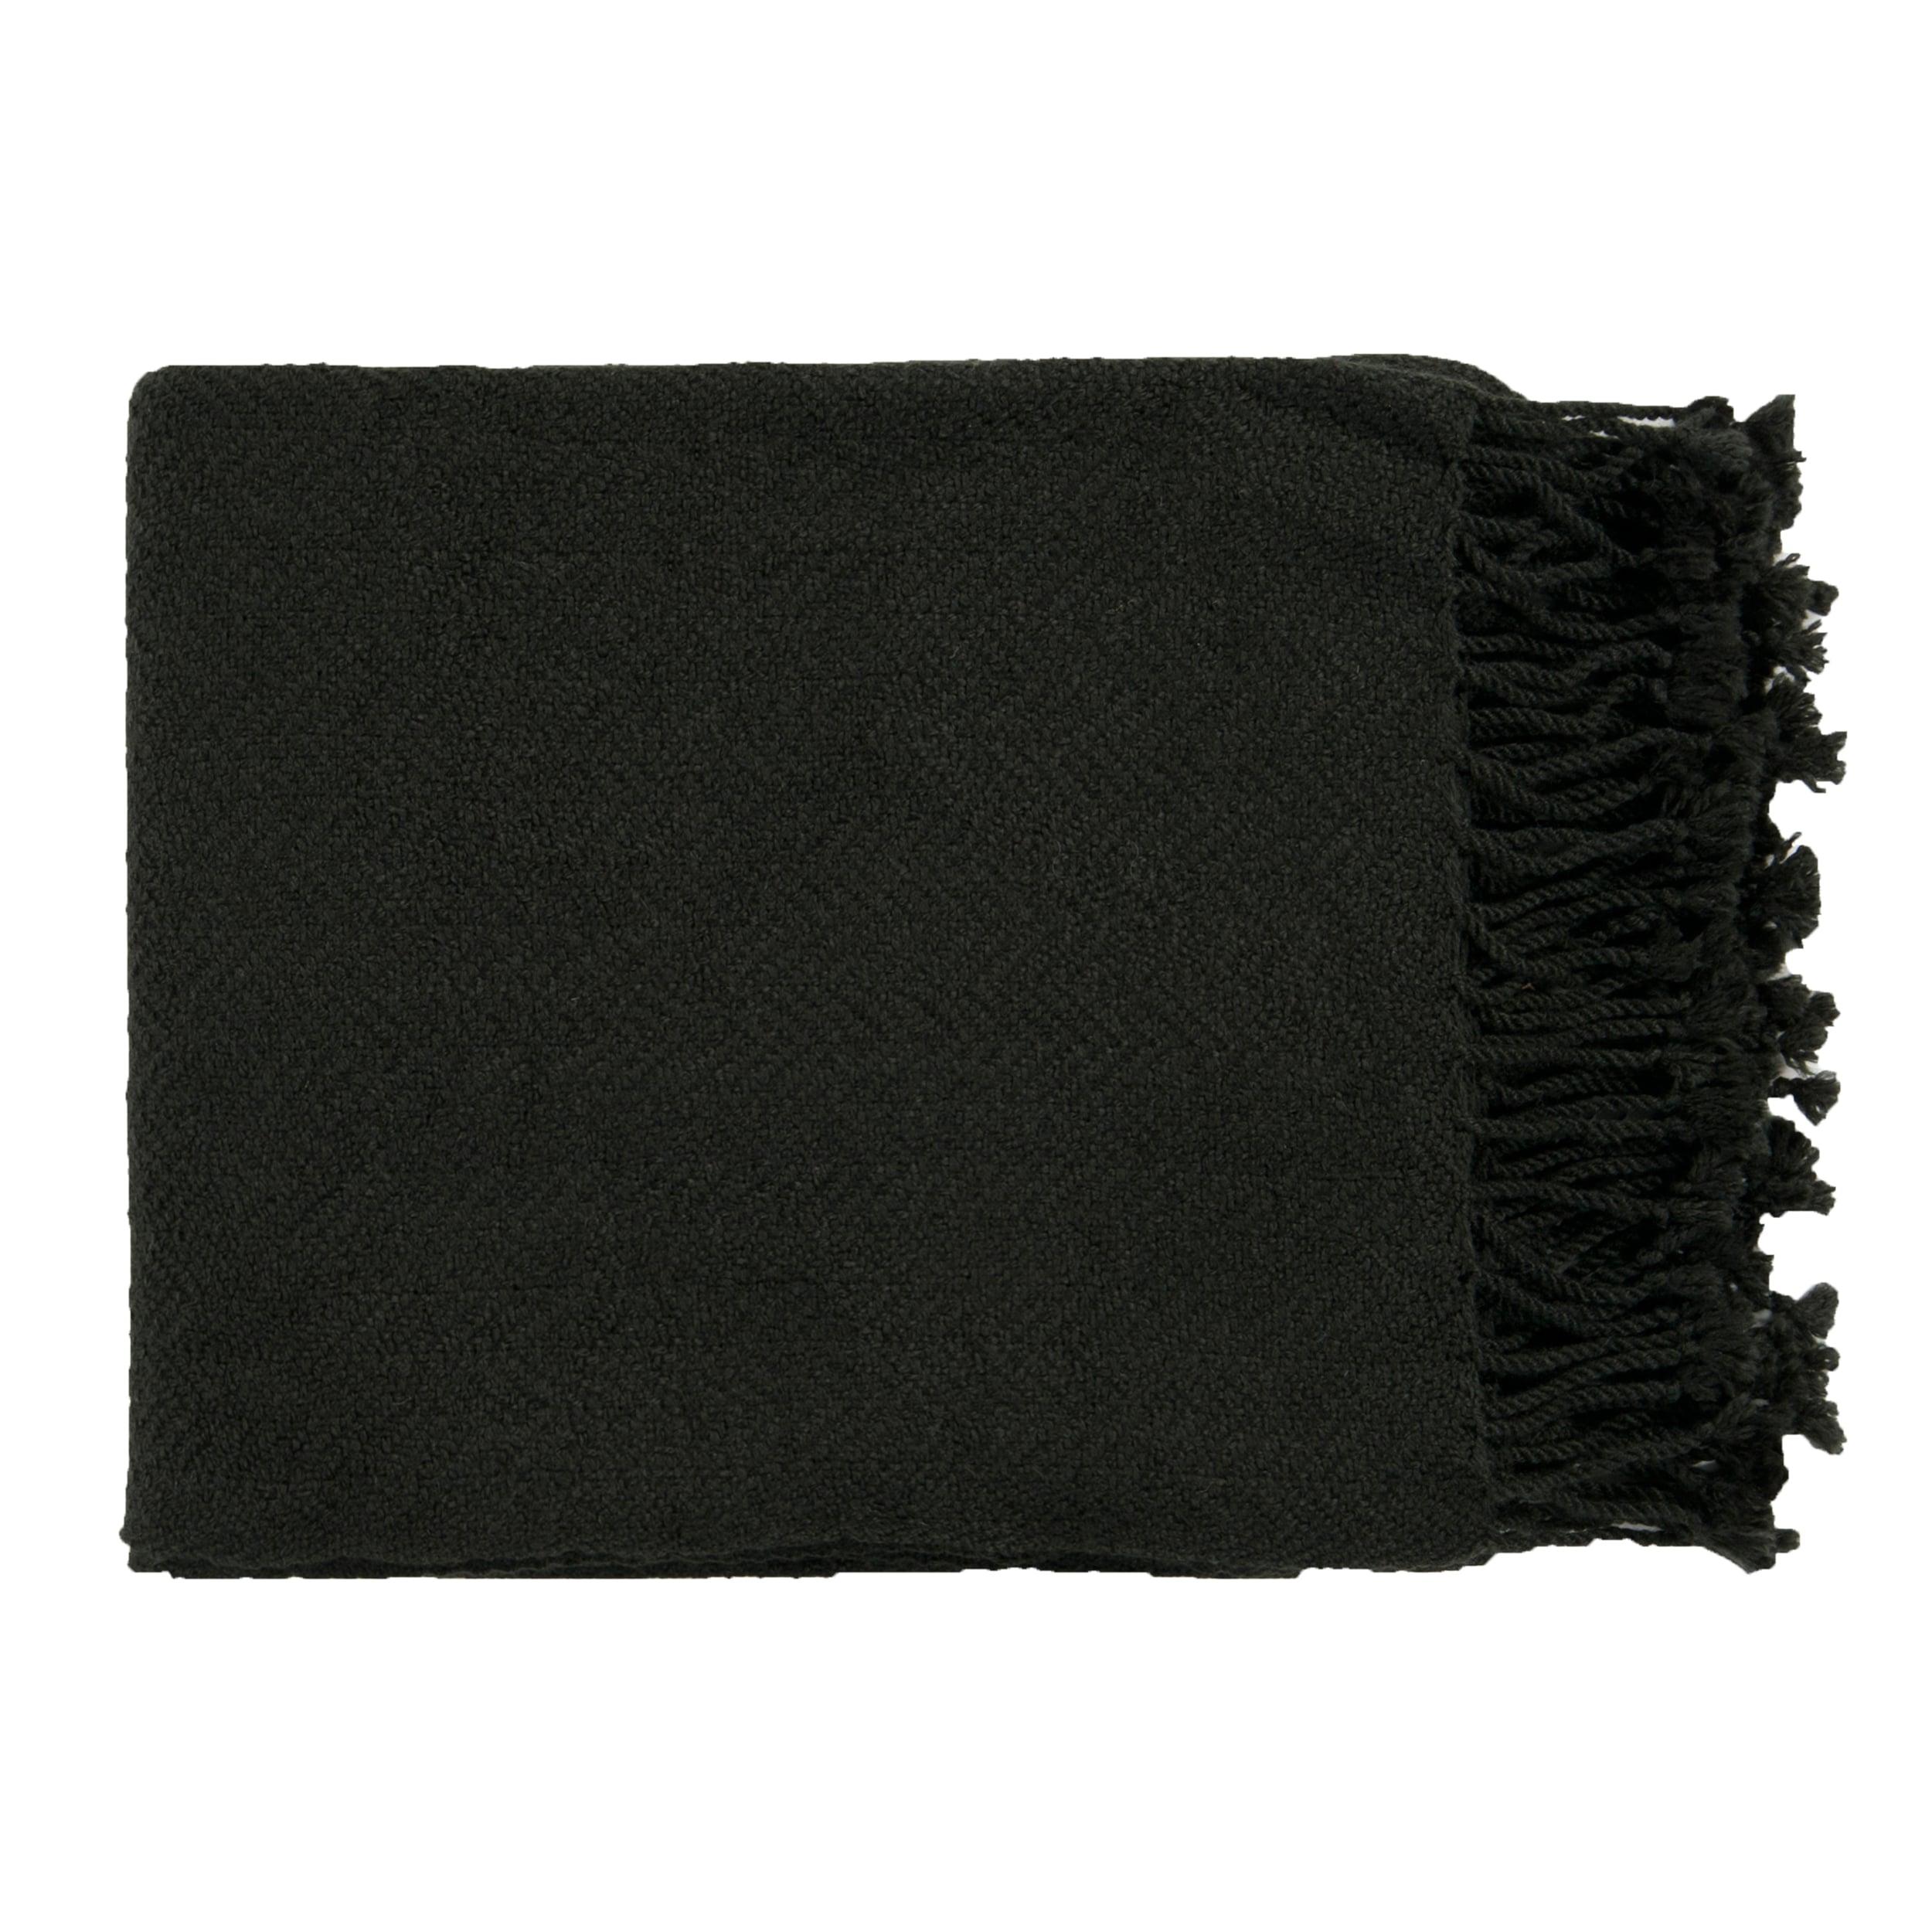 Woven Komondor Acrylic Throw Blanket (50 x 60)